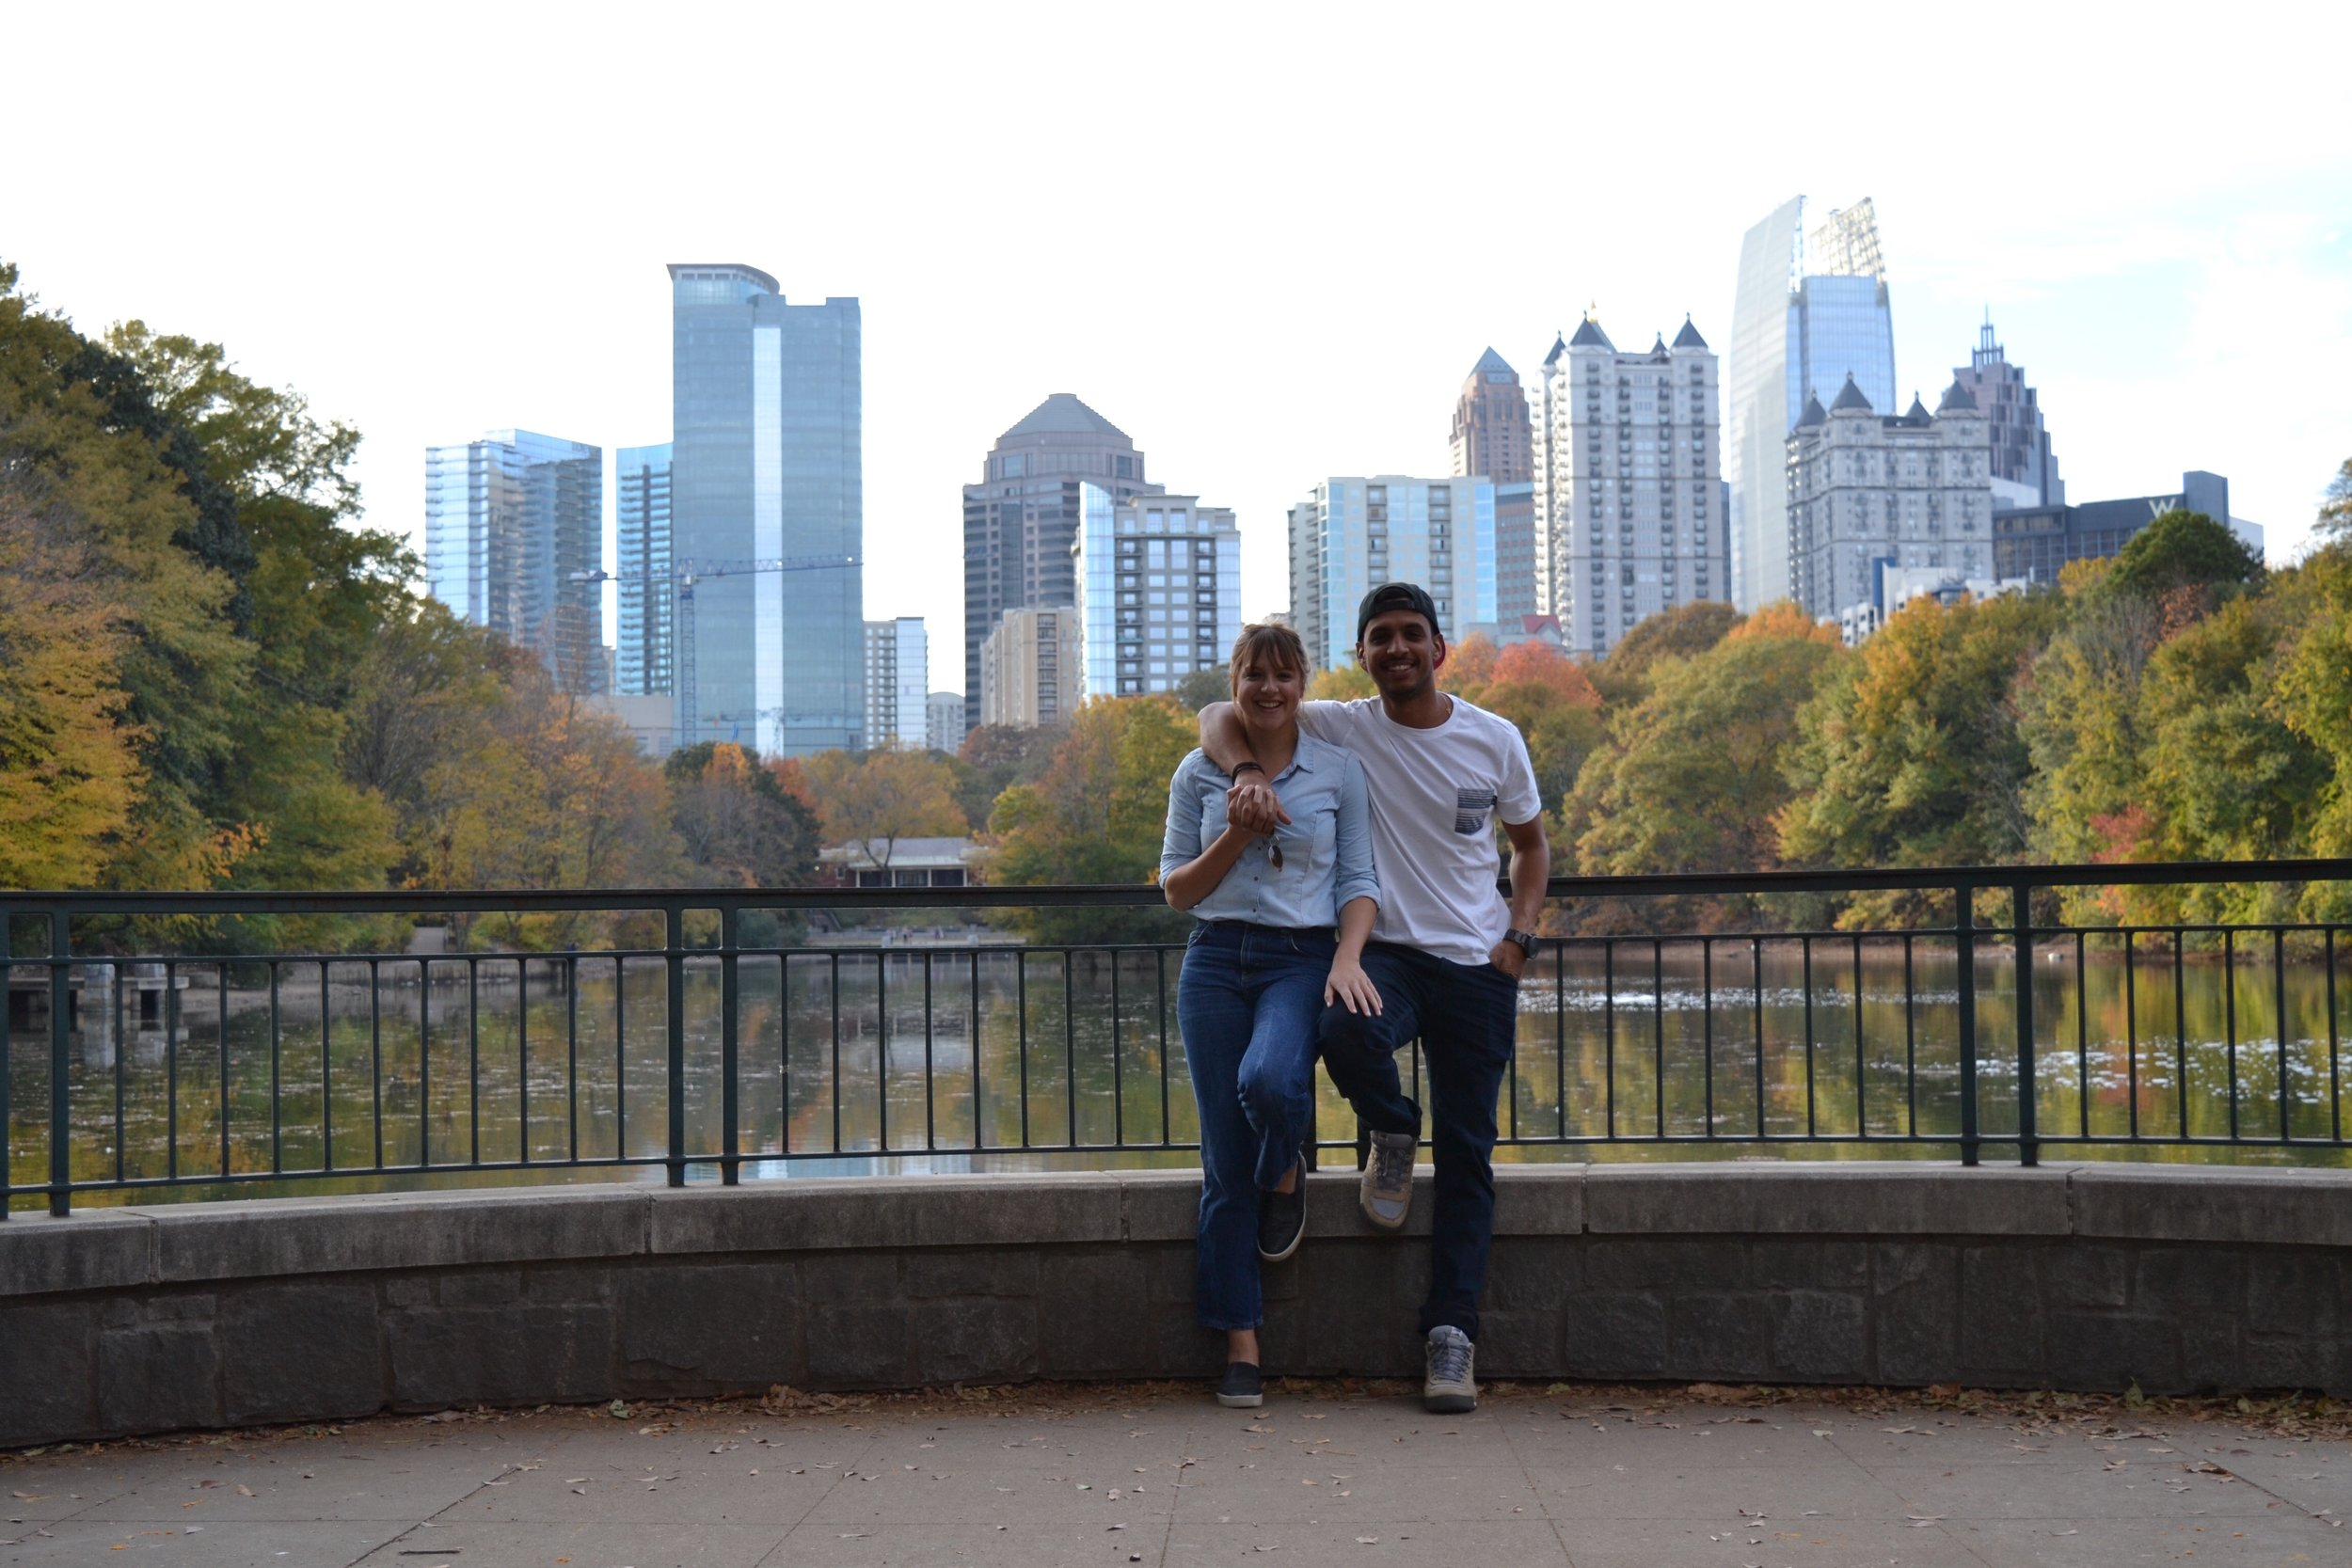 piedmont-park-with-midtown-in-background